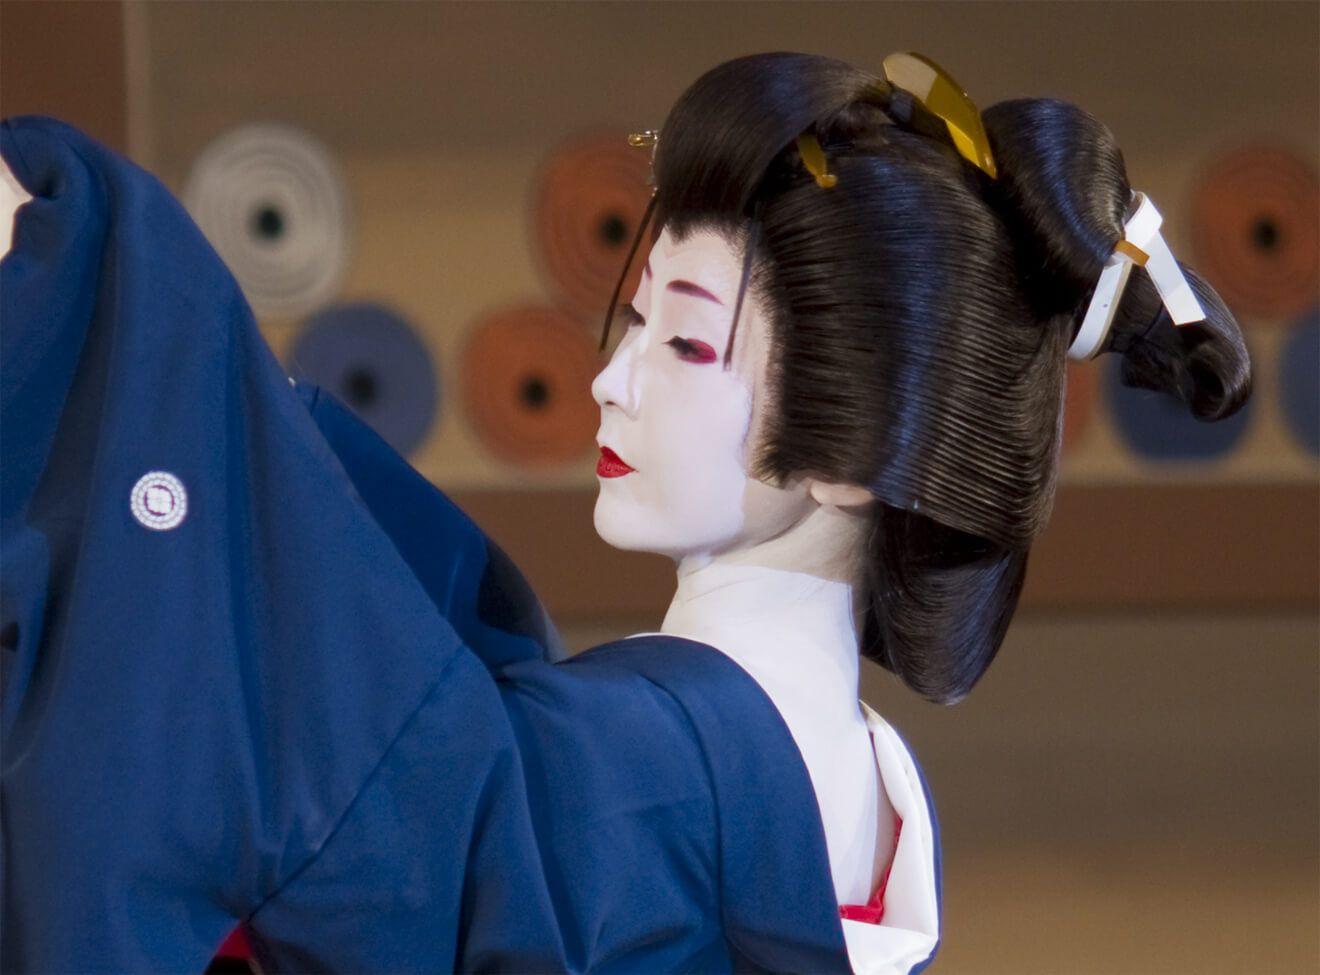 1000 Images About Geishas On Pinterest Geisha Japan Japanese